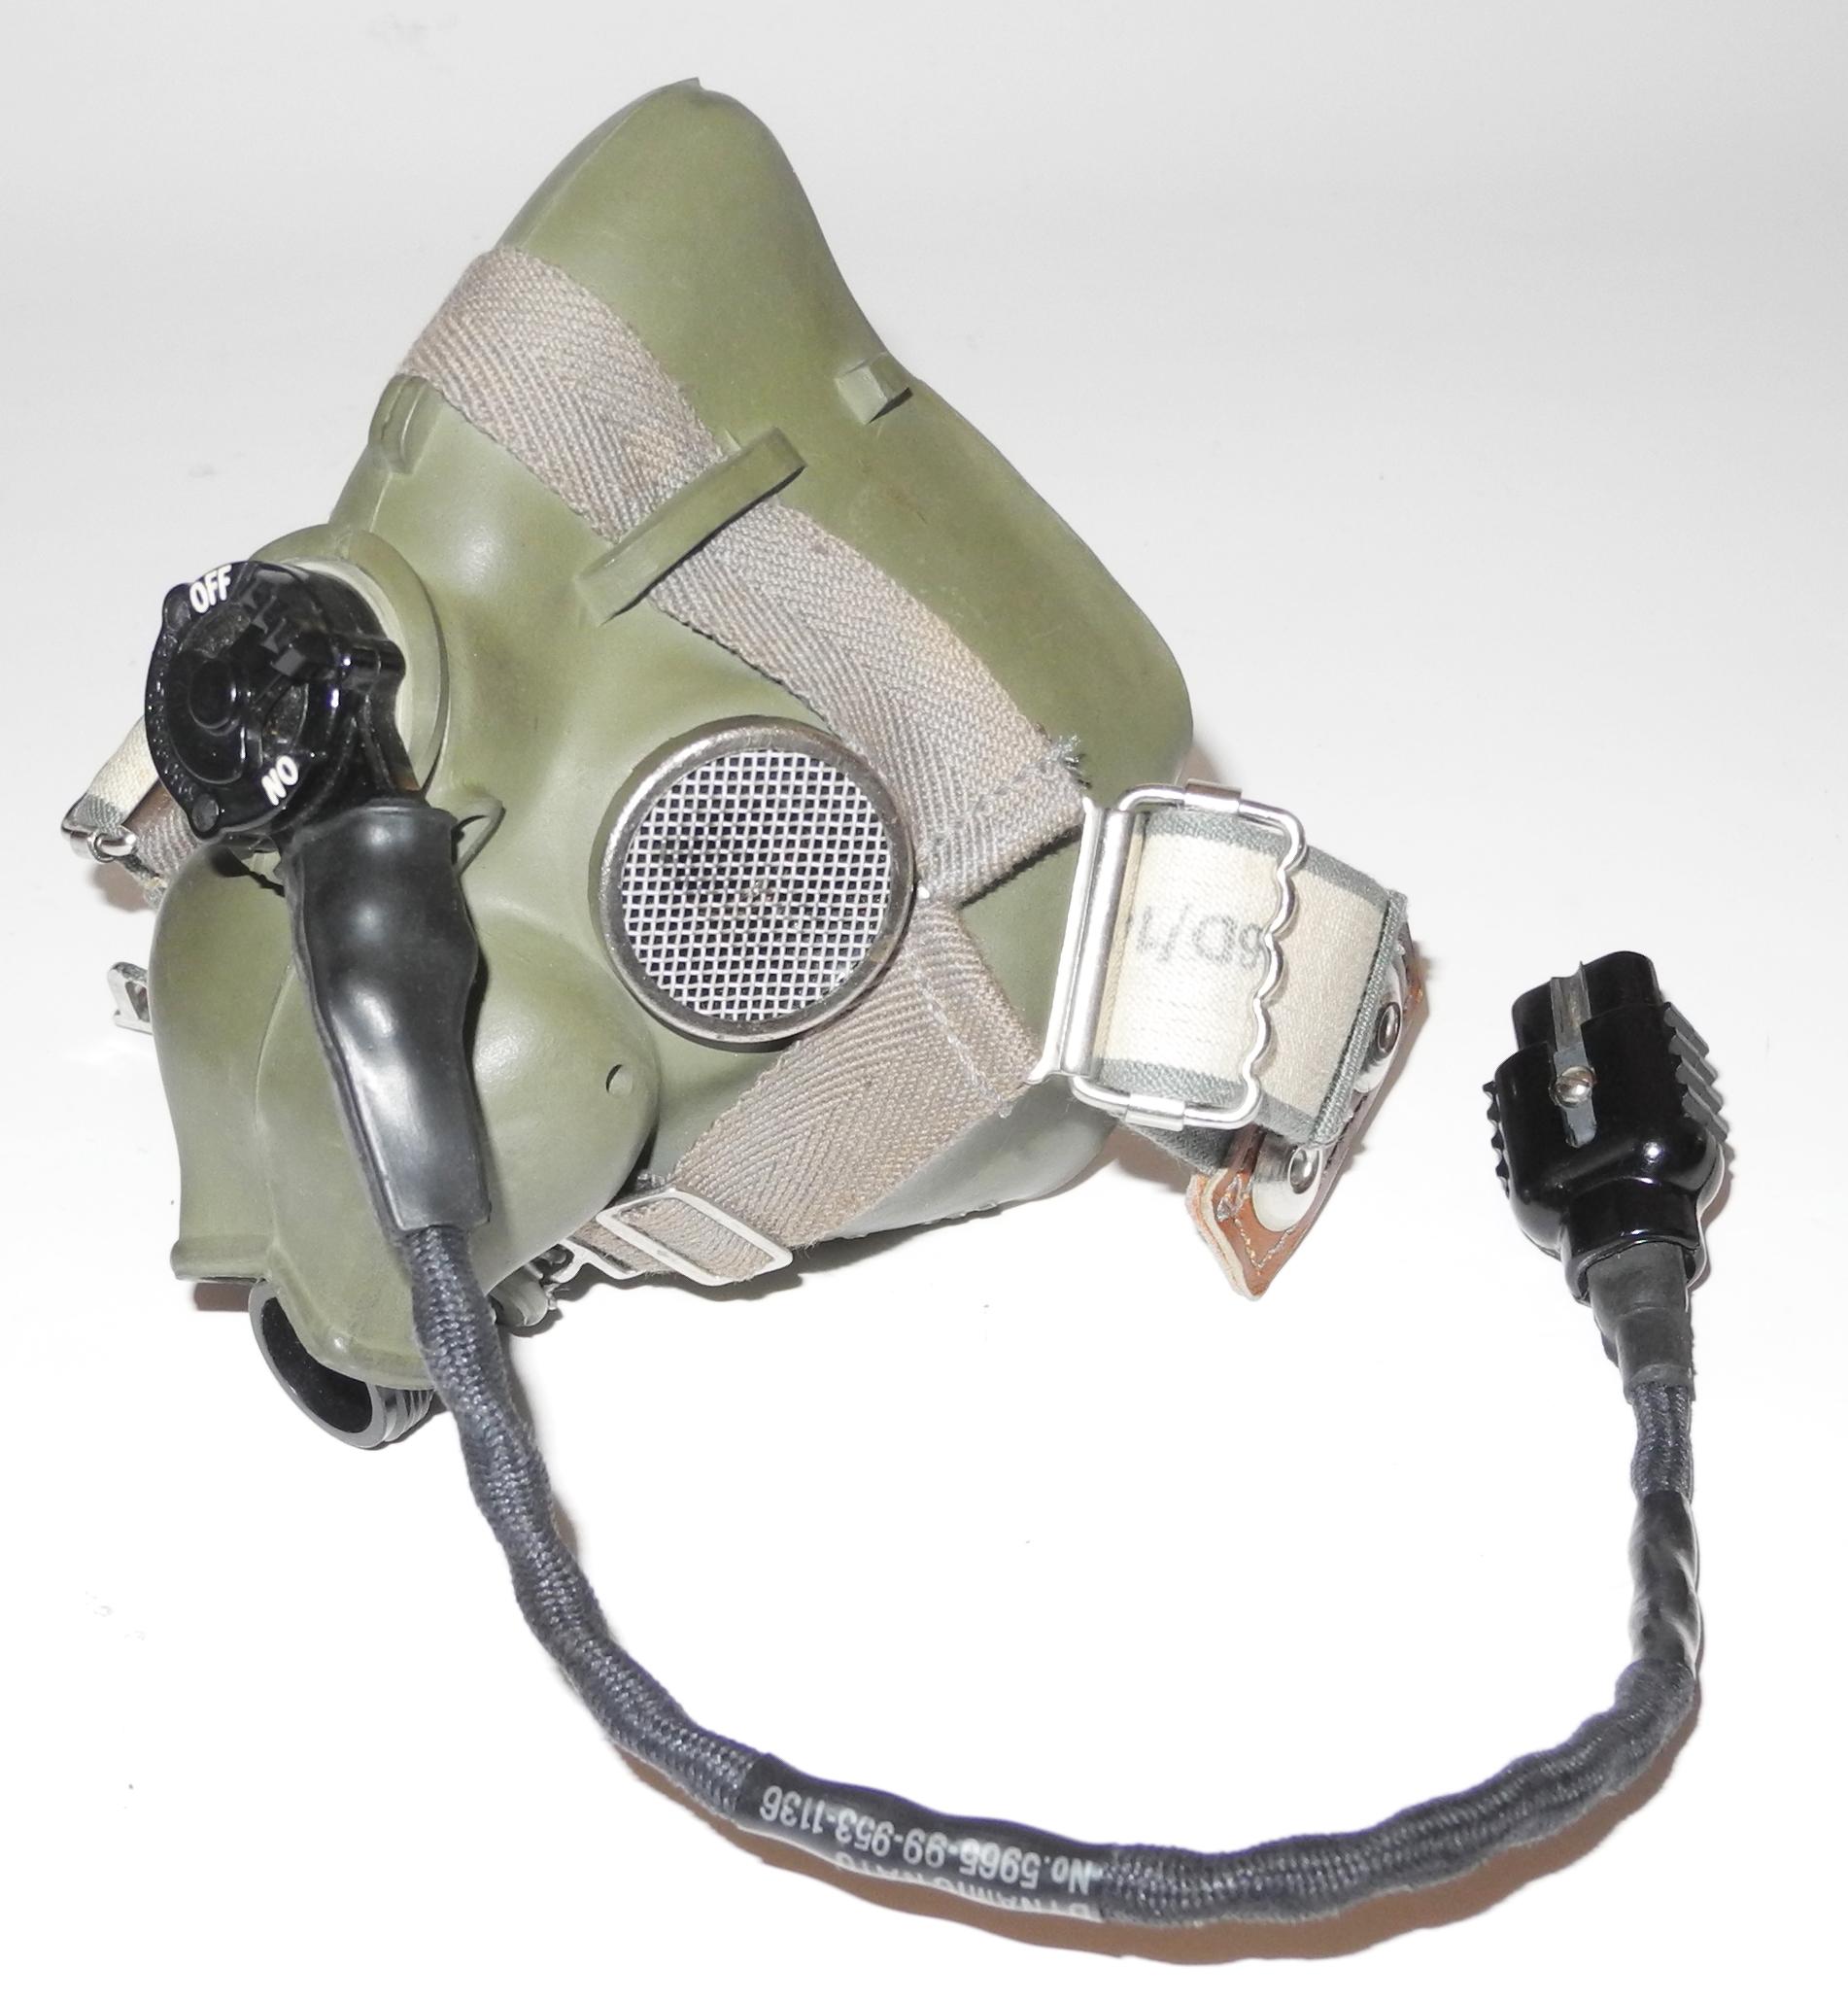 RAF Type H oxygen mask, Cold War era